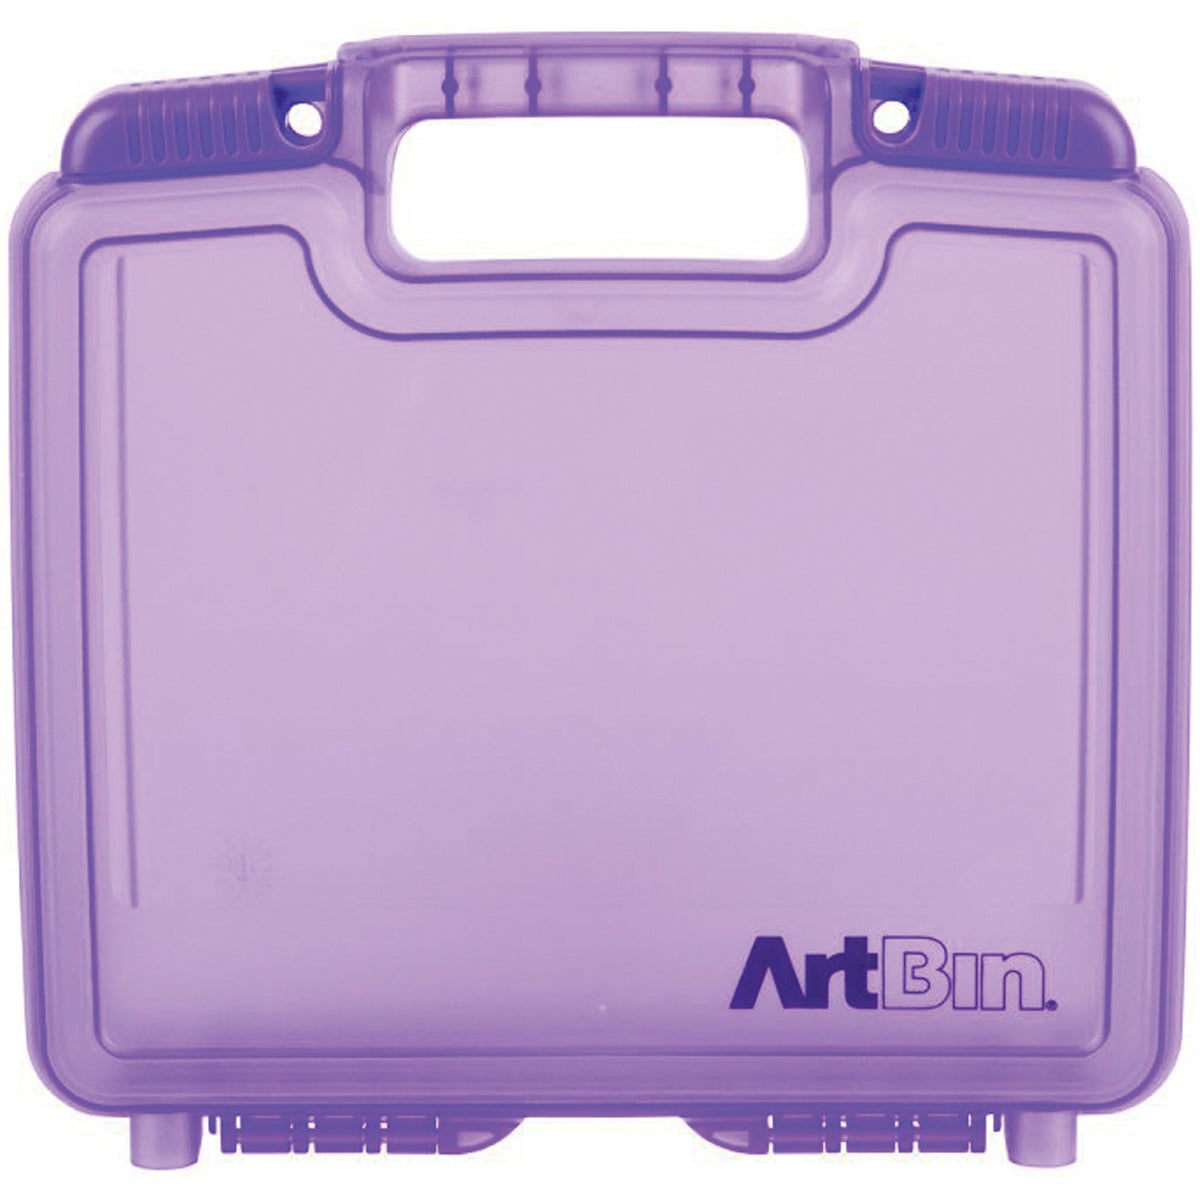 "ArtBin Quick View Deep Base Carrying Case-10.25""X3.25""X9.625"" Translucent Purple"